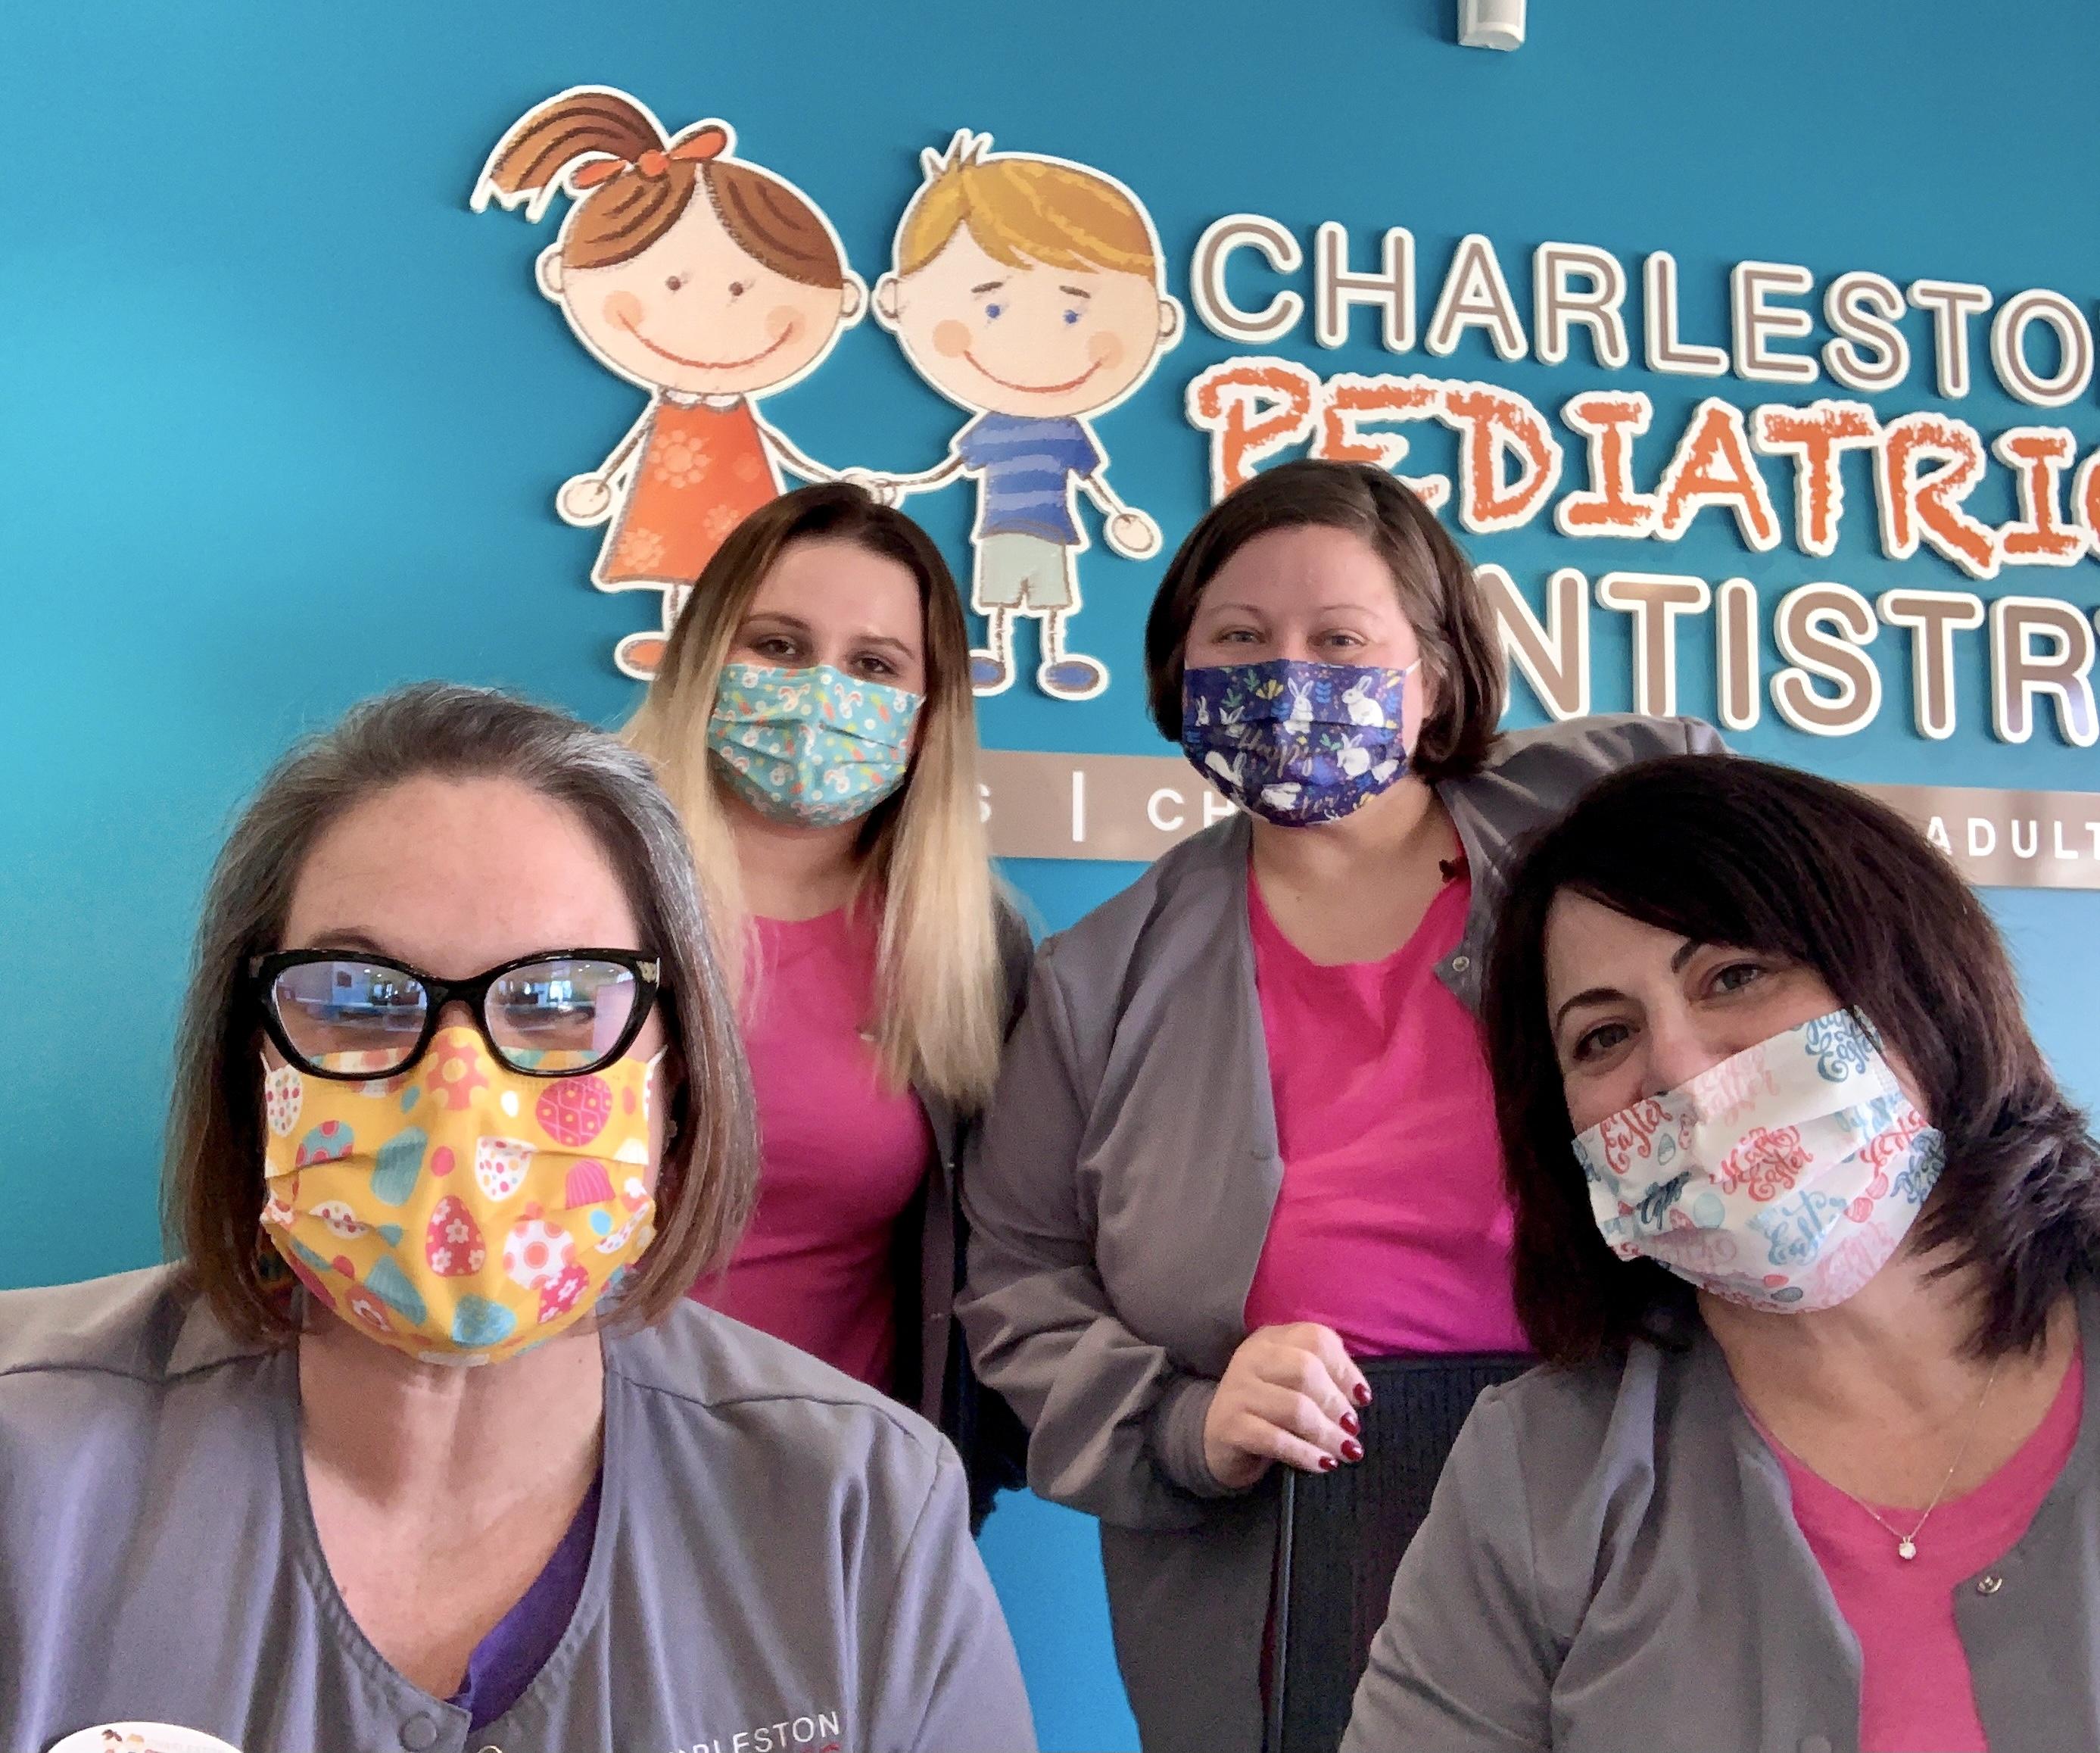 Charleston Pediatric Dentistry, Ashley Patnoe DDS, reviews | Pediatric Dentists at 1573 Washington St E - Charleston WV